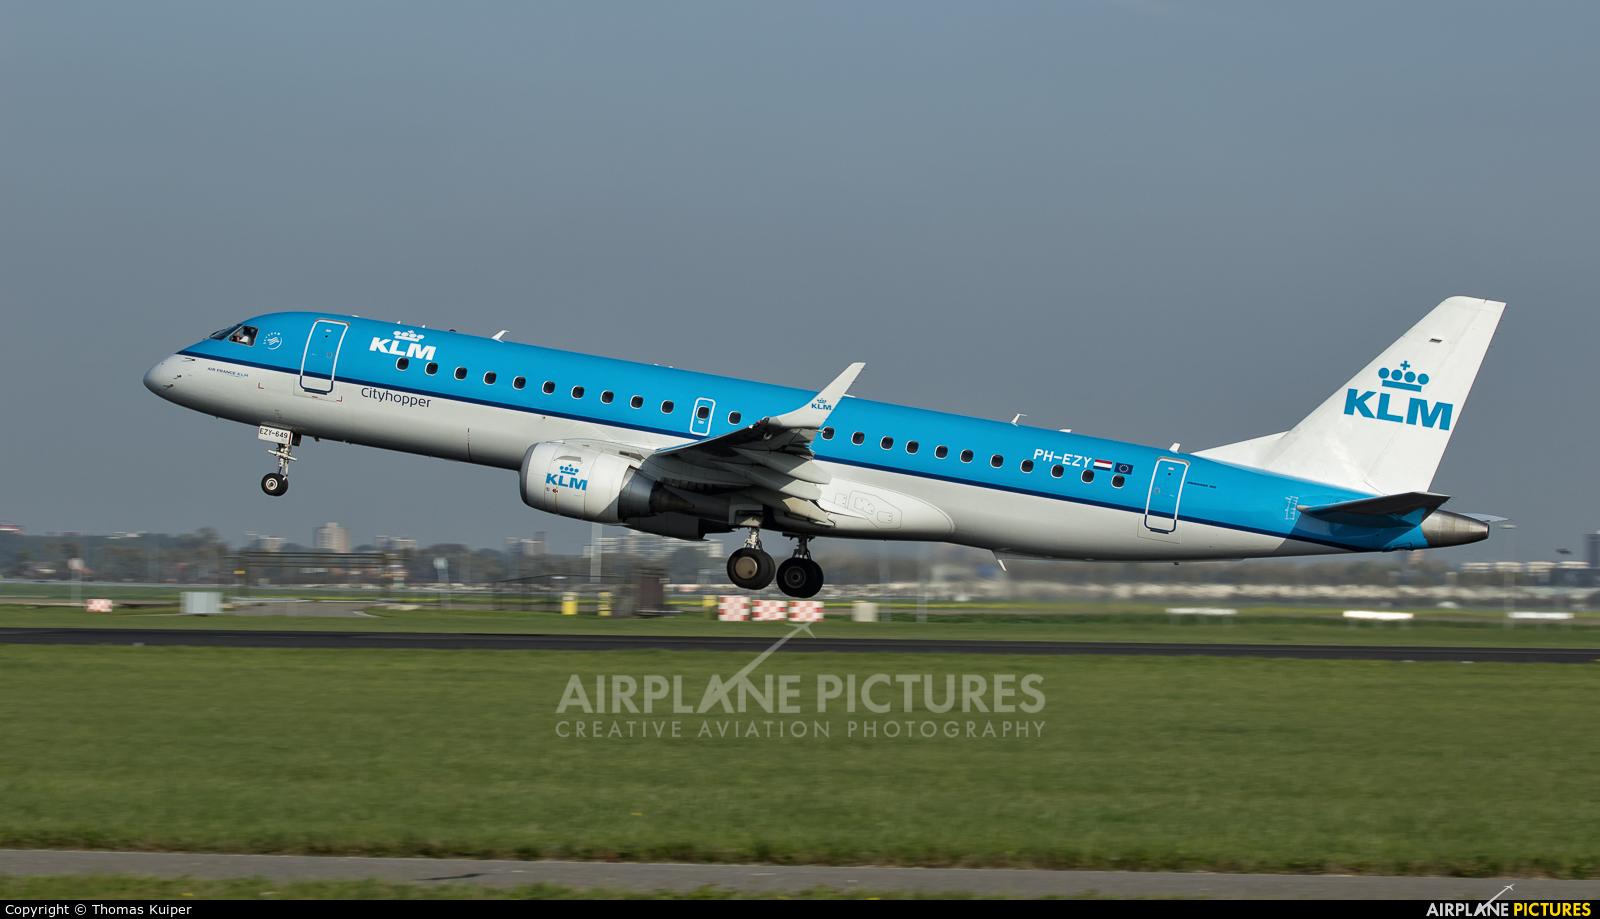 KLM Cityhopper PH-EZY aircraft at Amsterdam - Schiphol